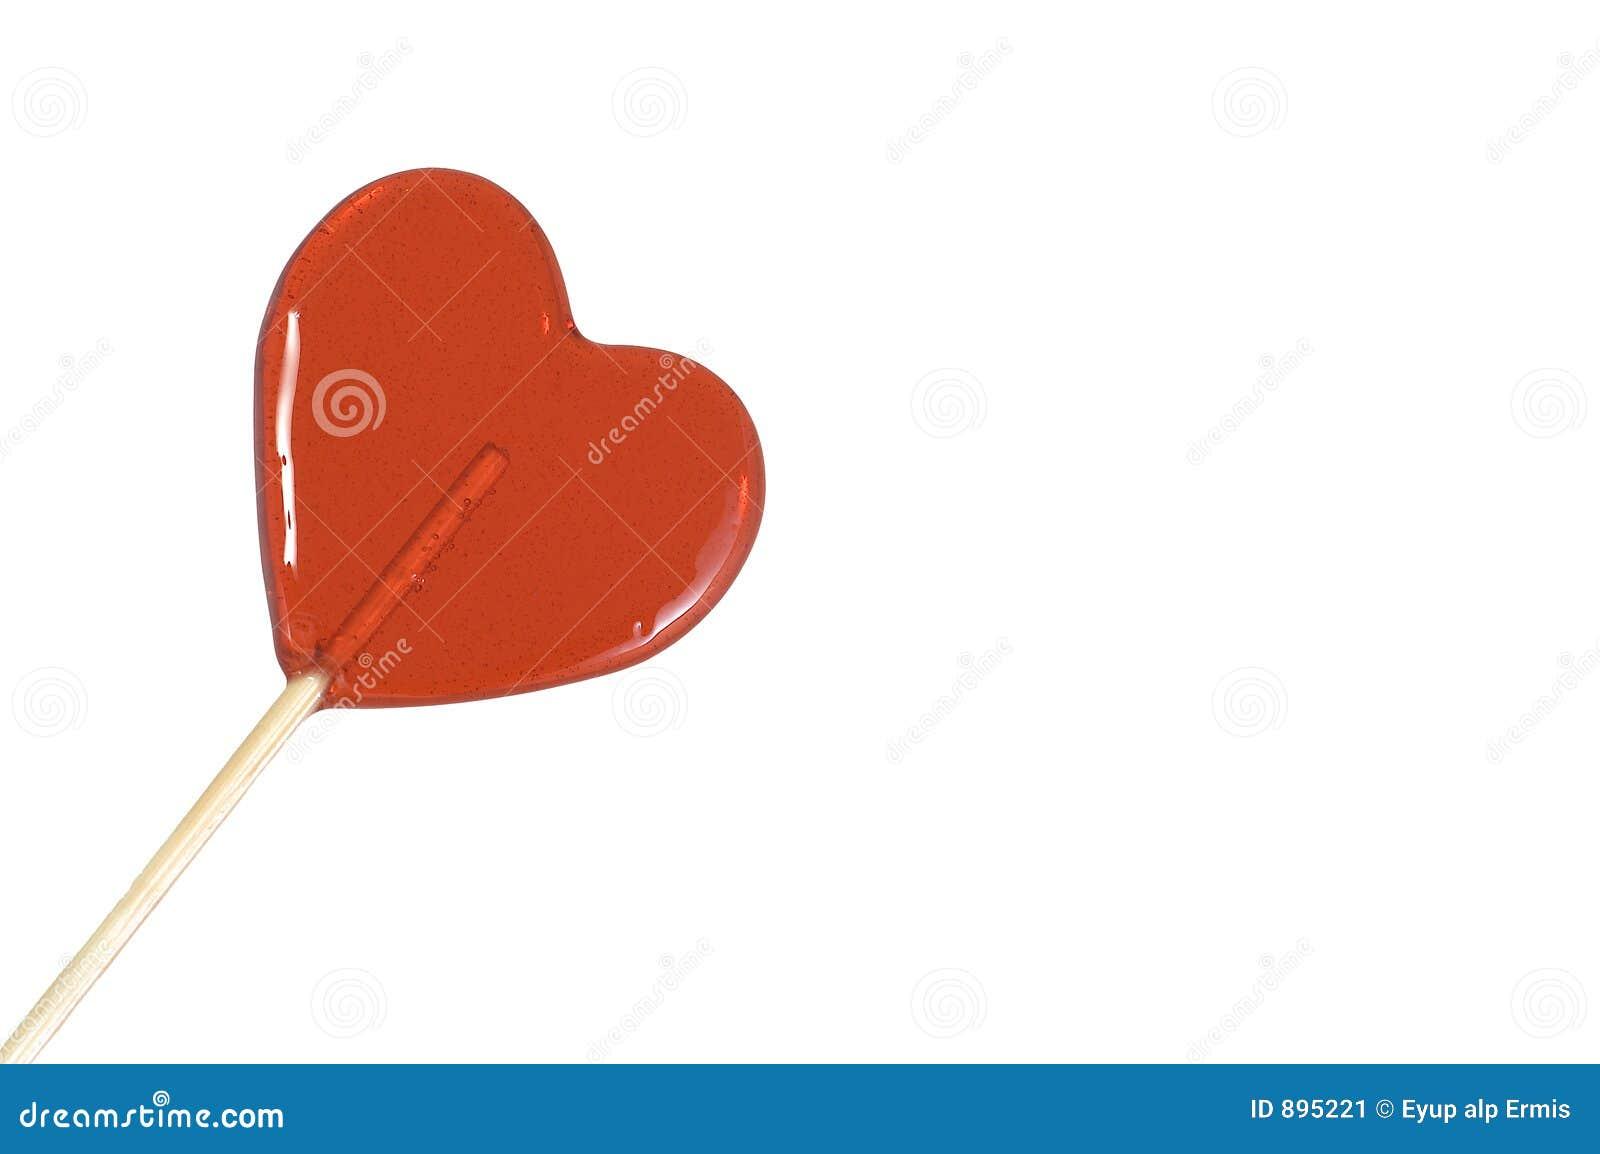 Caramelo en forma de corazón